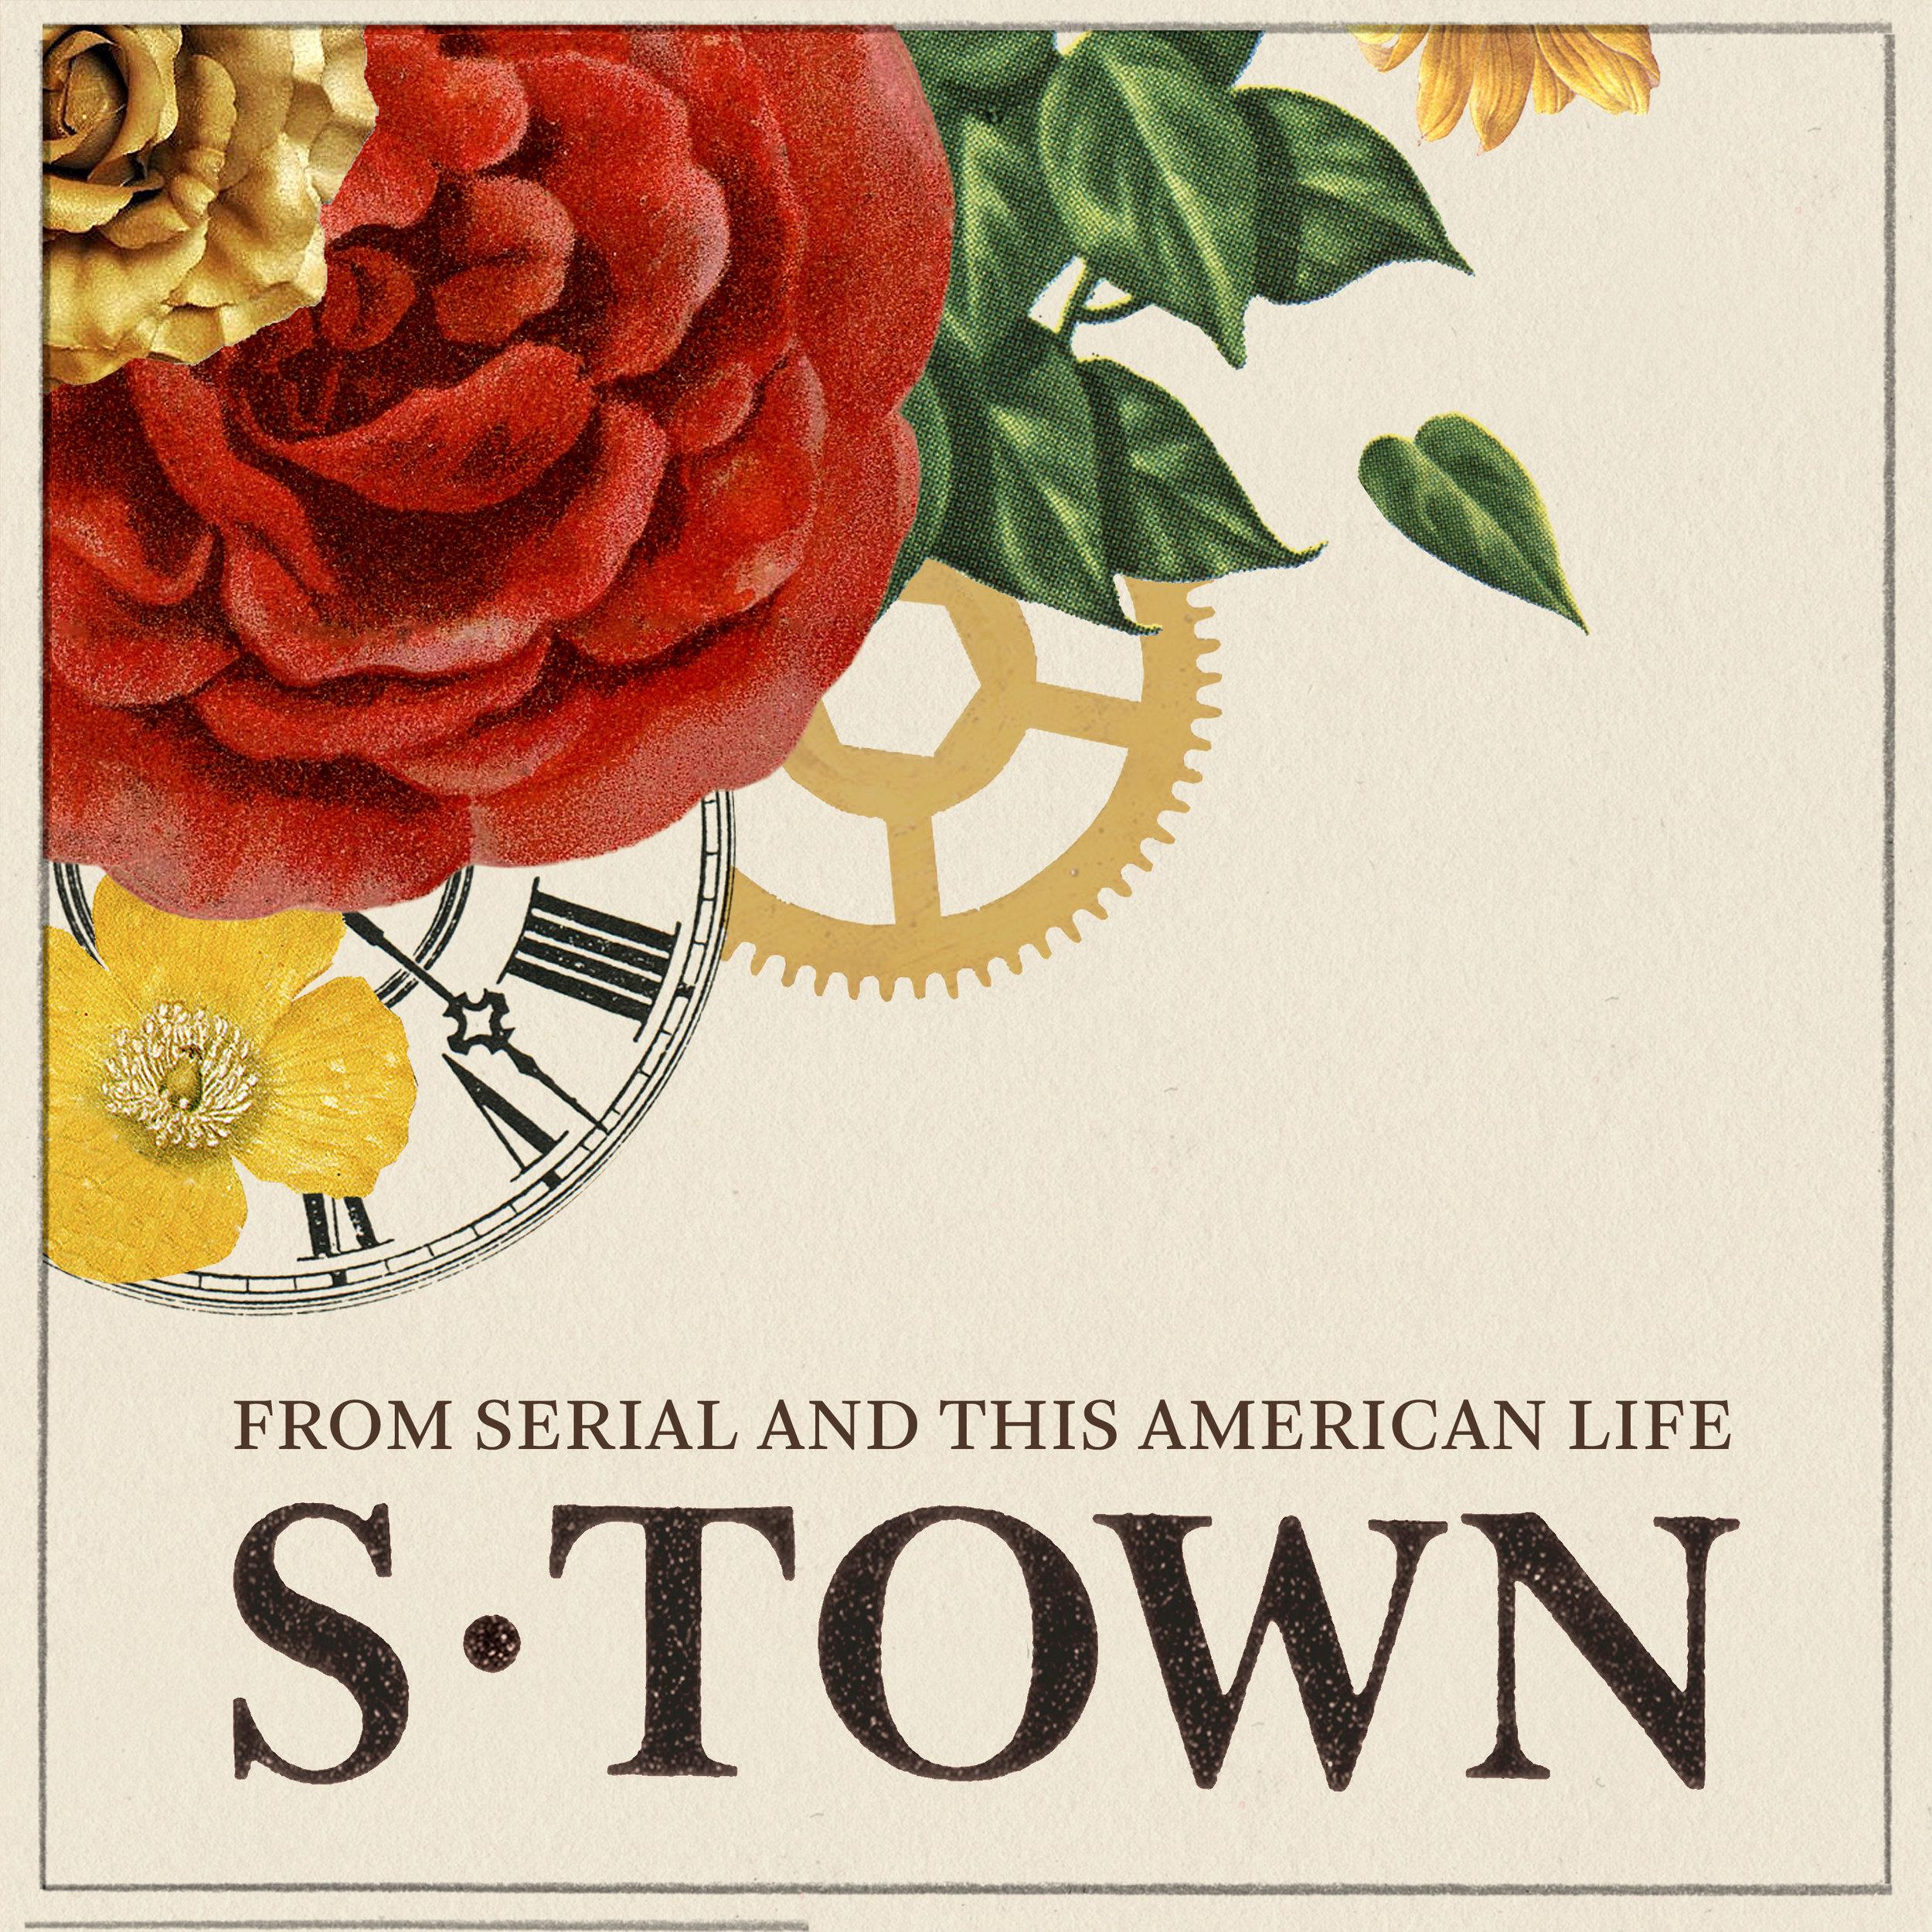 S-town podcast.jpg